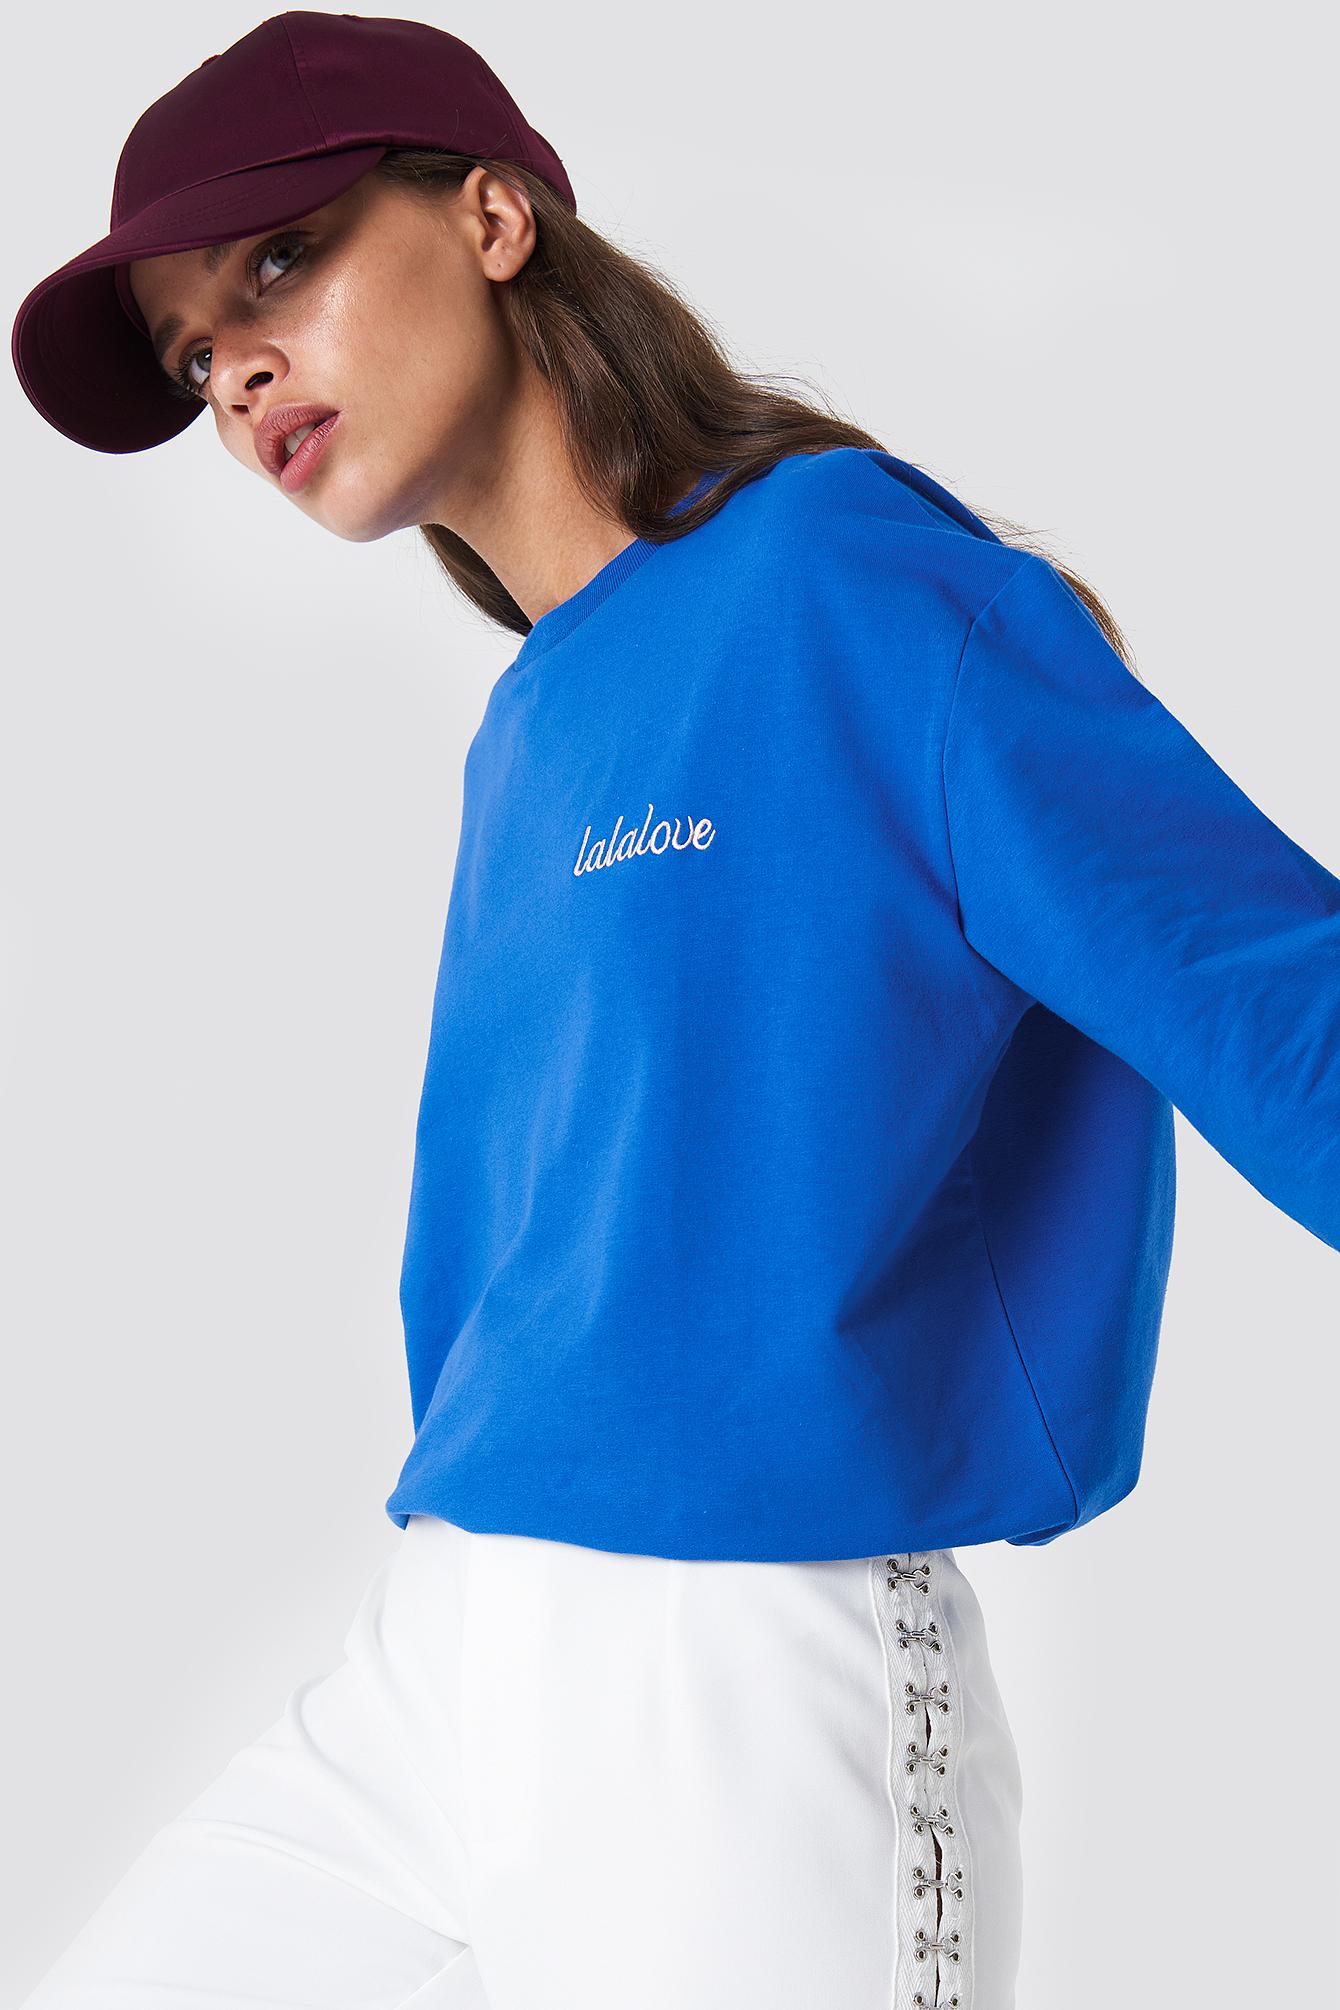 MOVES Tessi-Lala Sweater - Blue